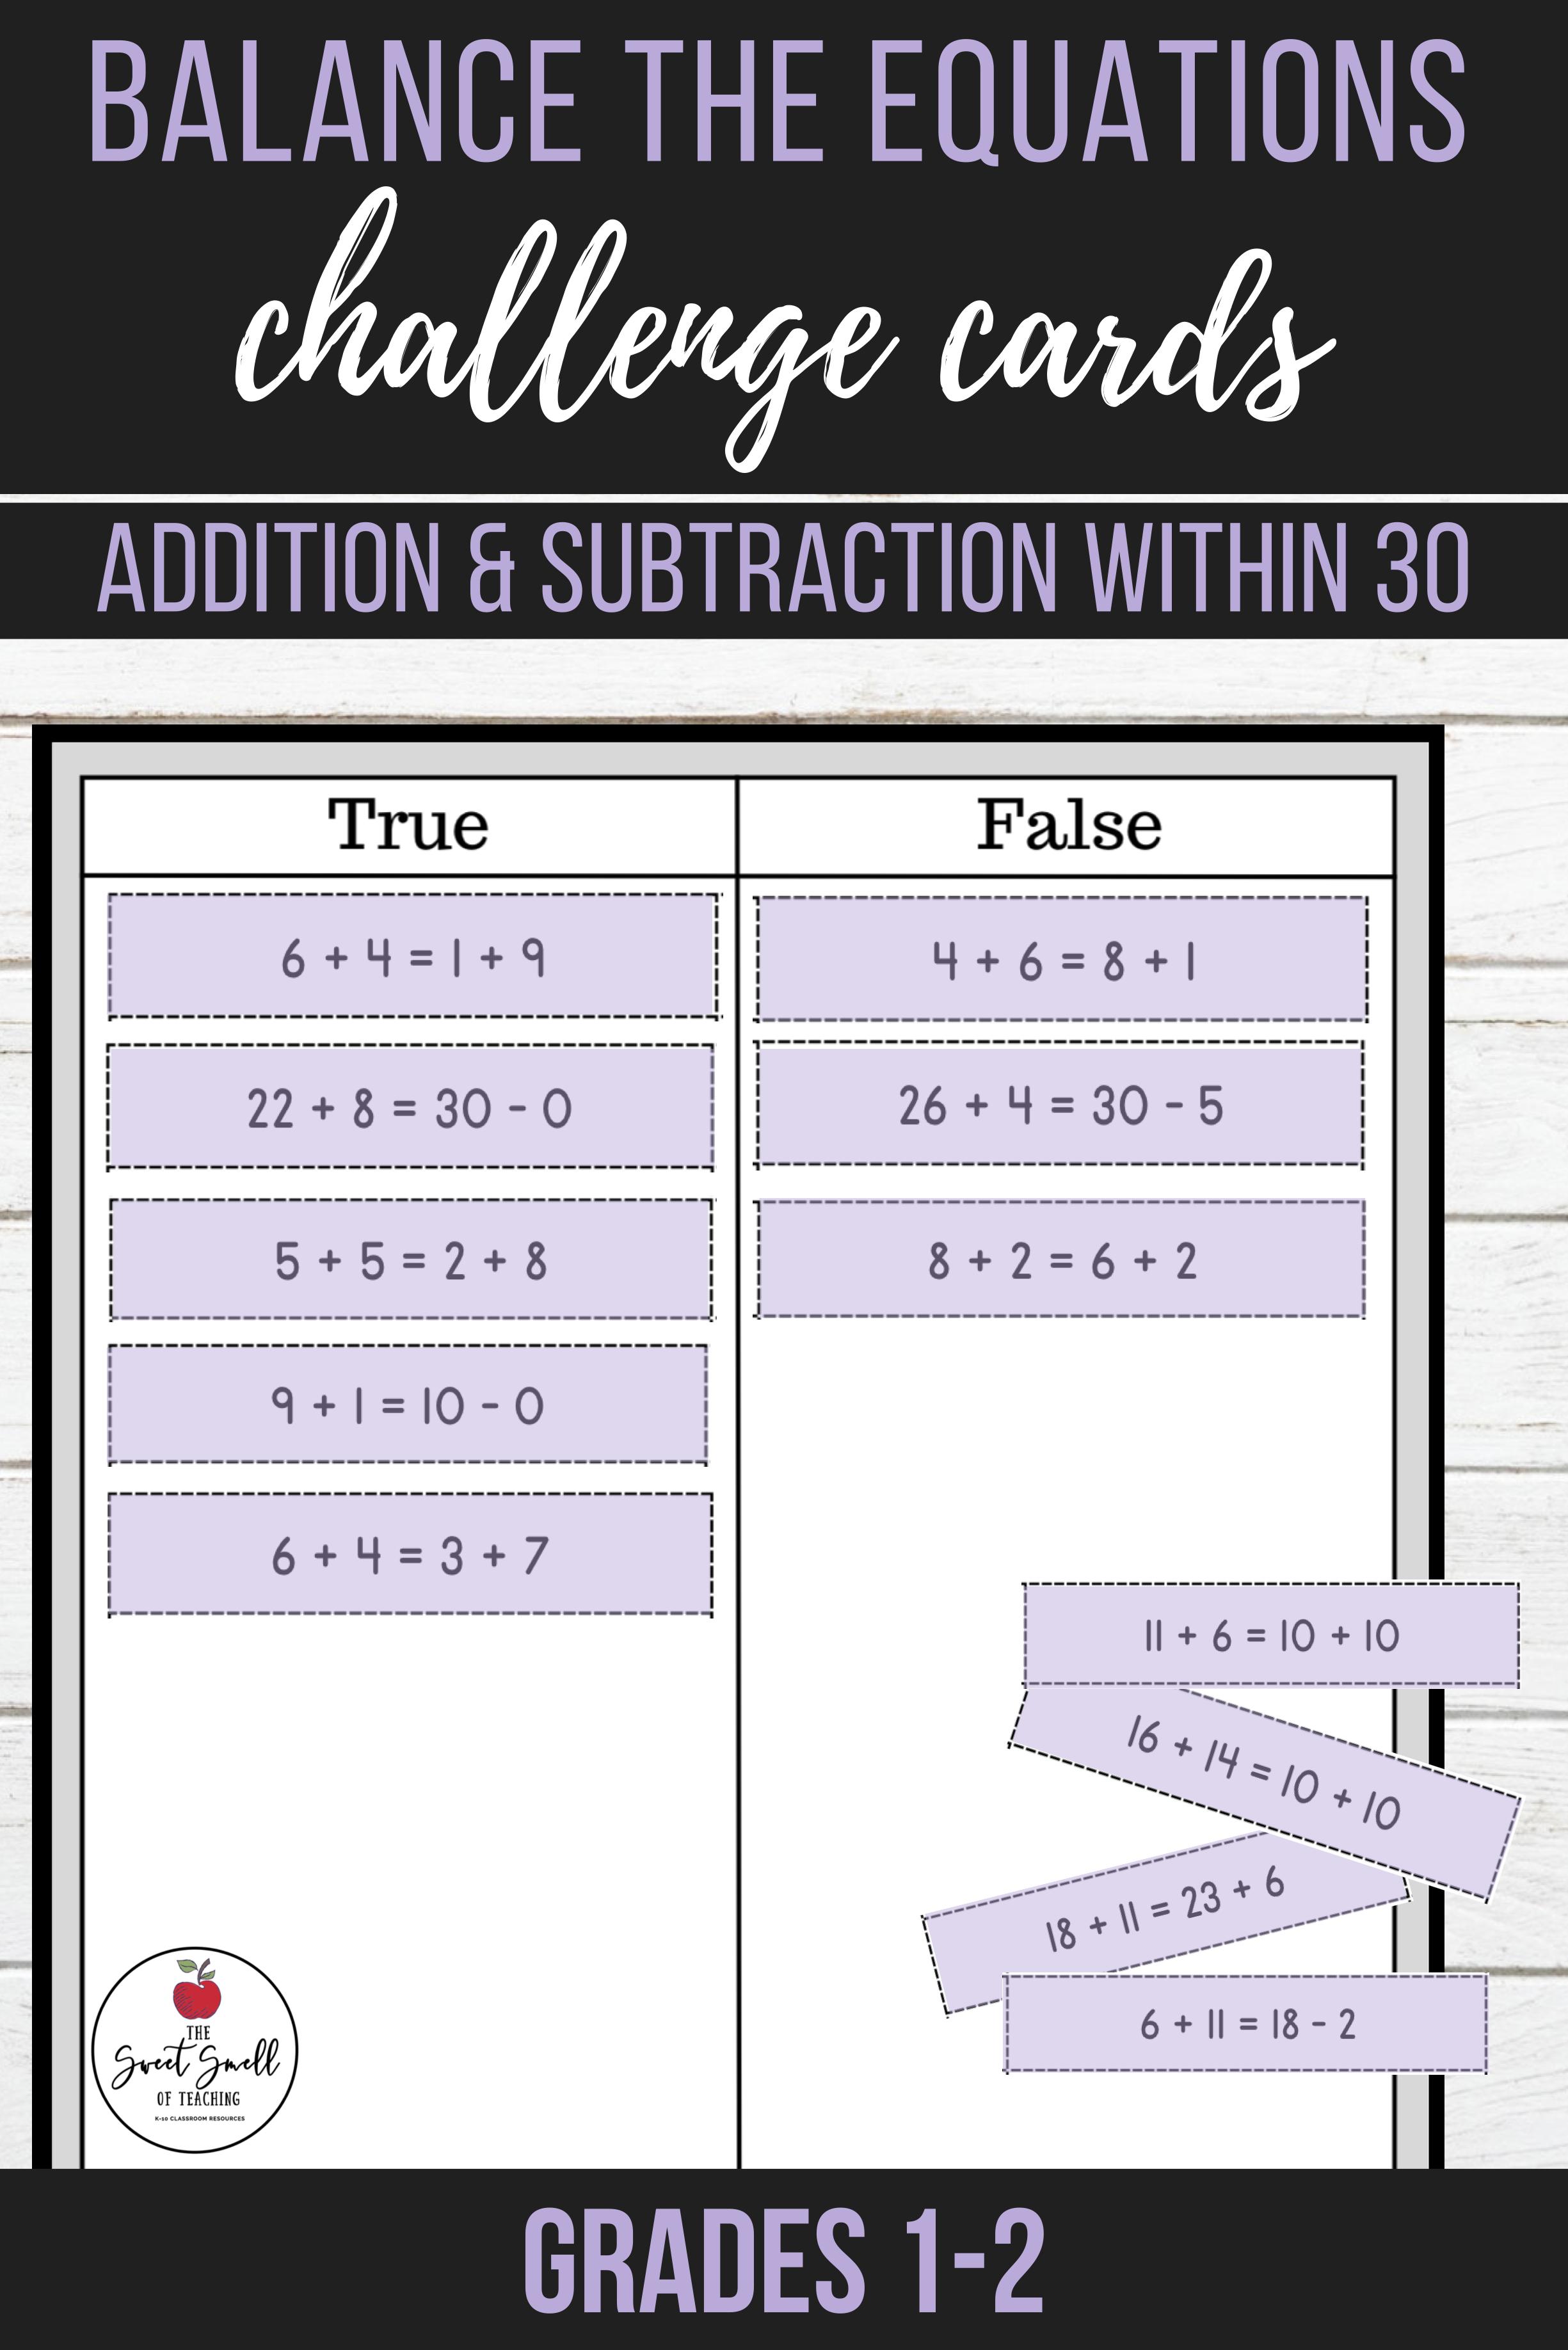 Balance The Equations